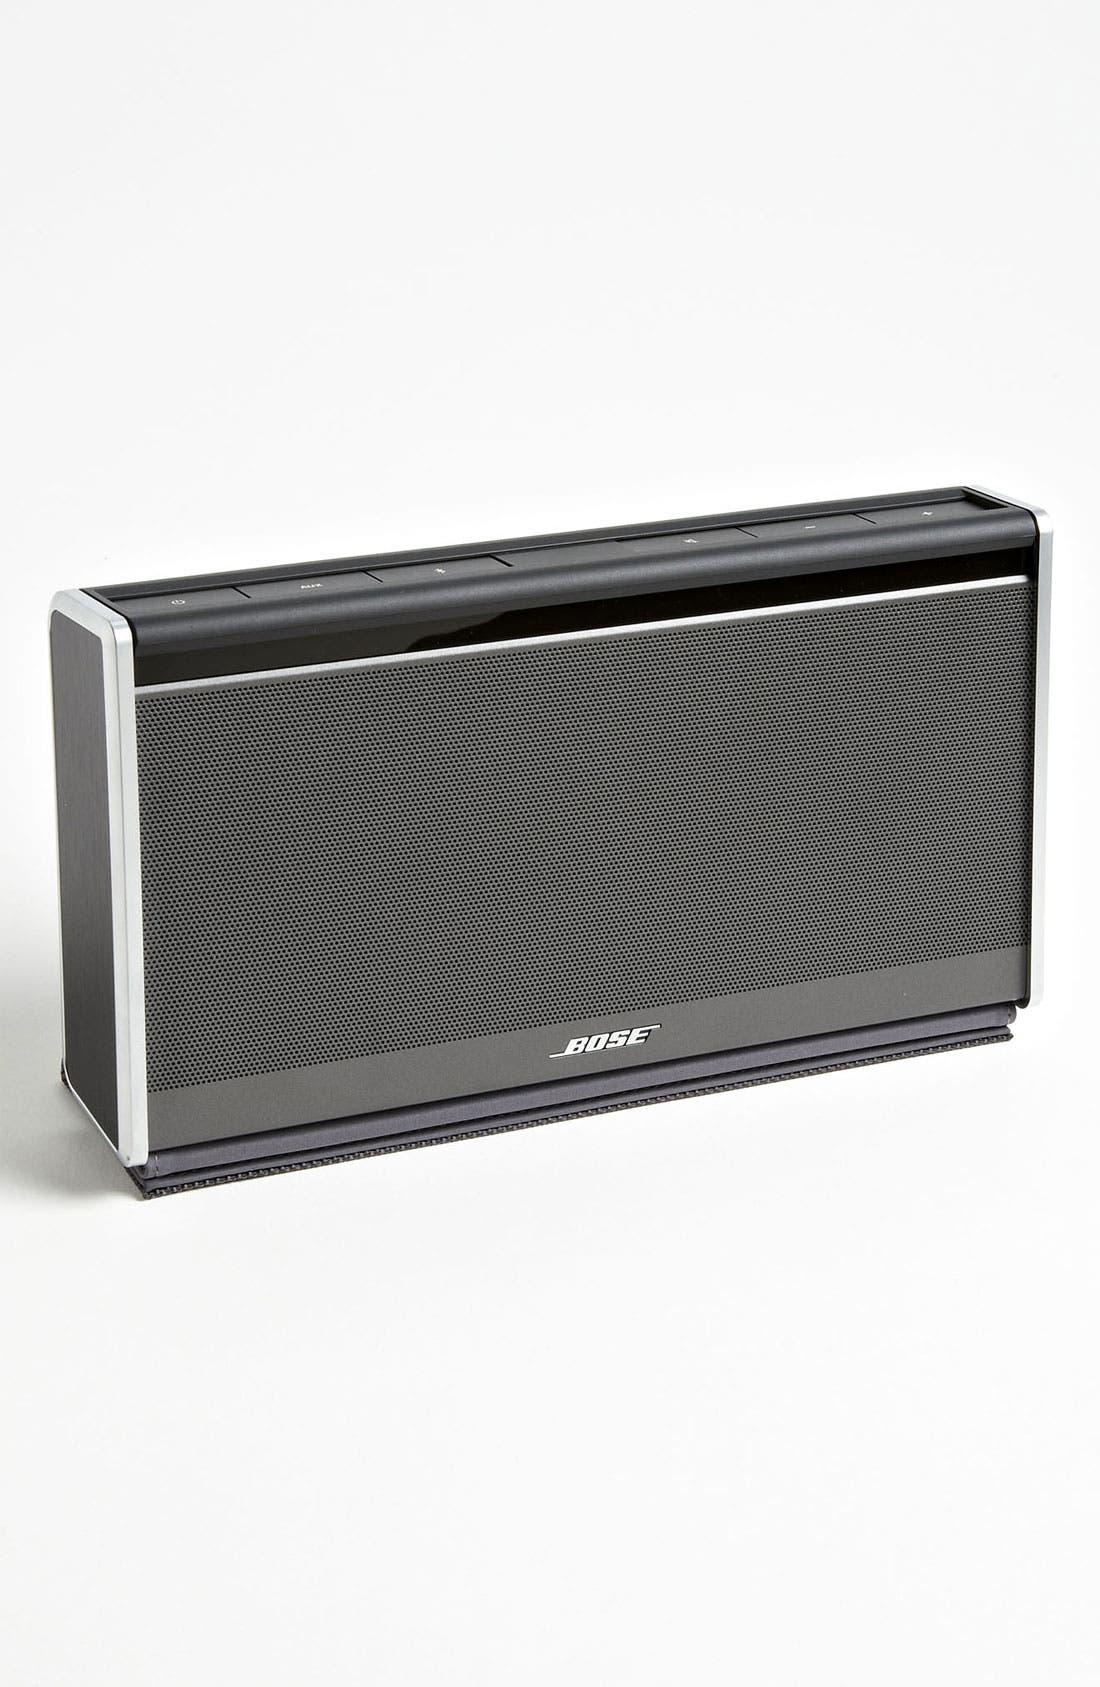 Alternate Image 1 Selected - Bose® SoundLink® Bluetooth® Mobile Speaker II - Nylon Edition